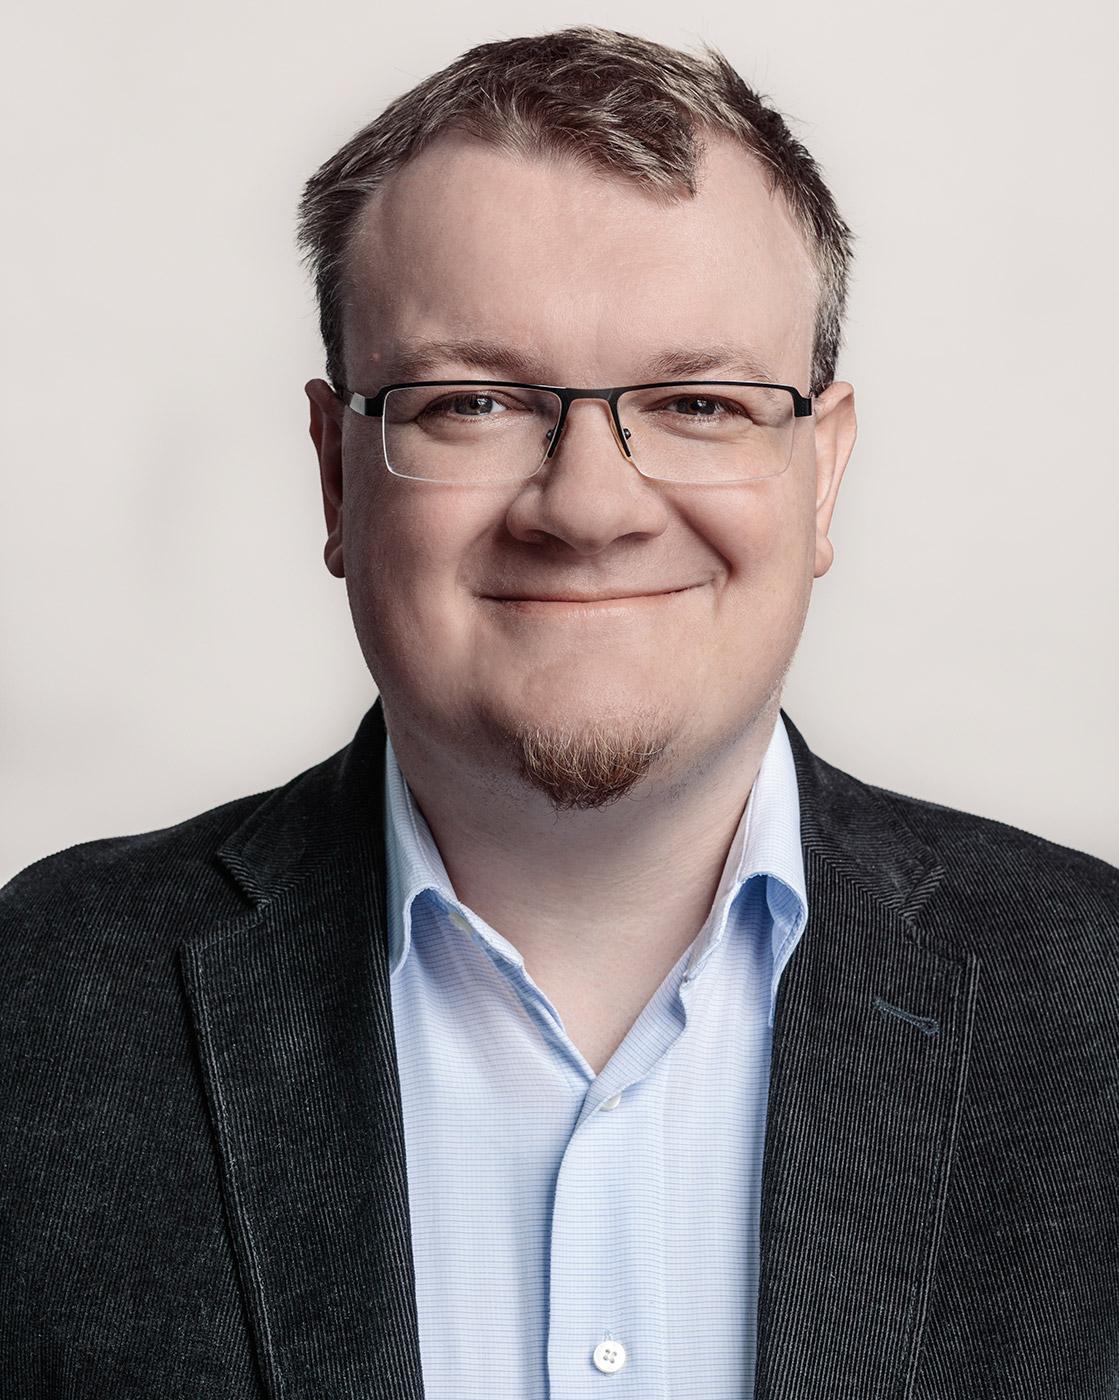 Christoph Rieß